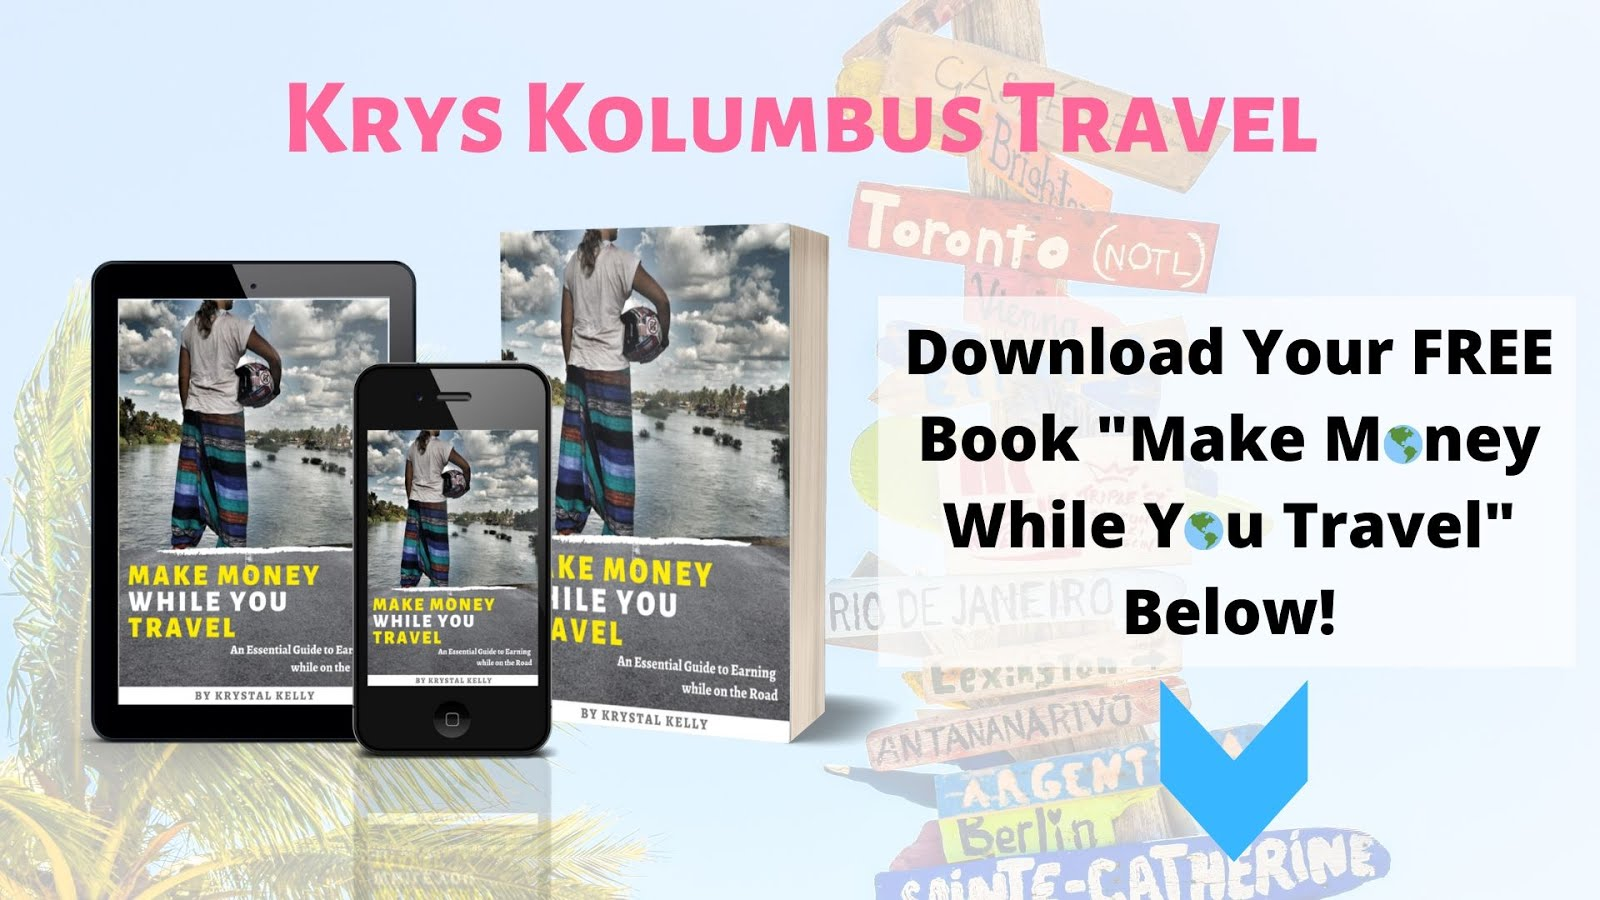 Krys Kolumbus Travel